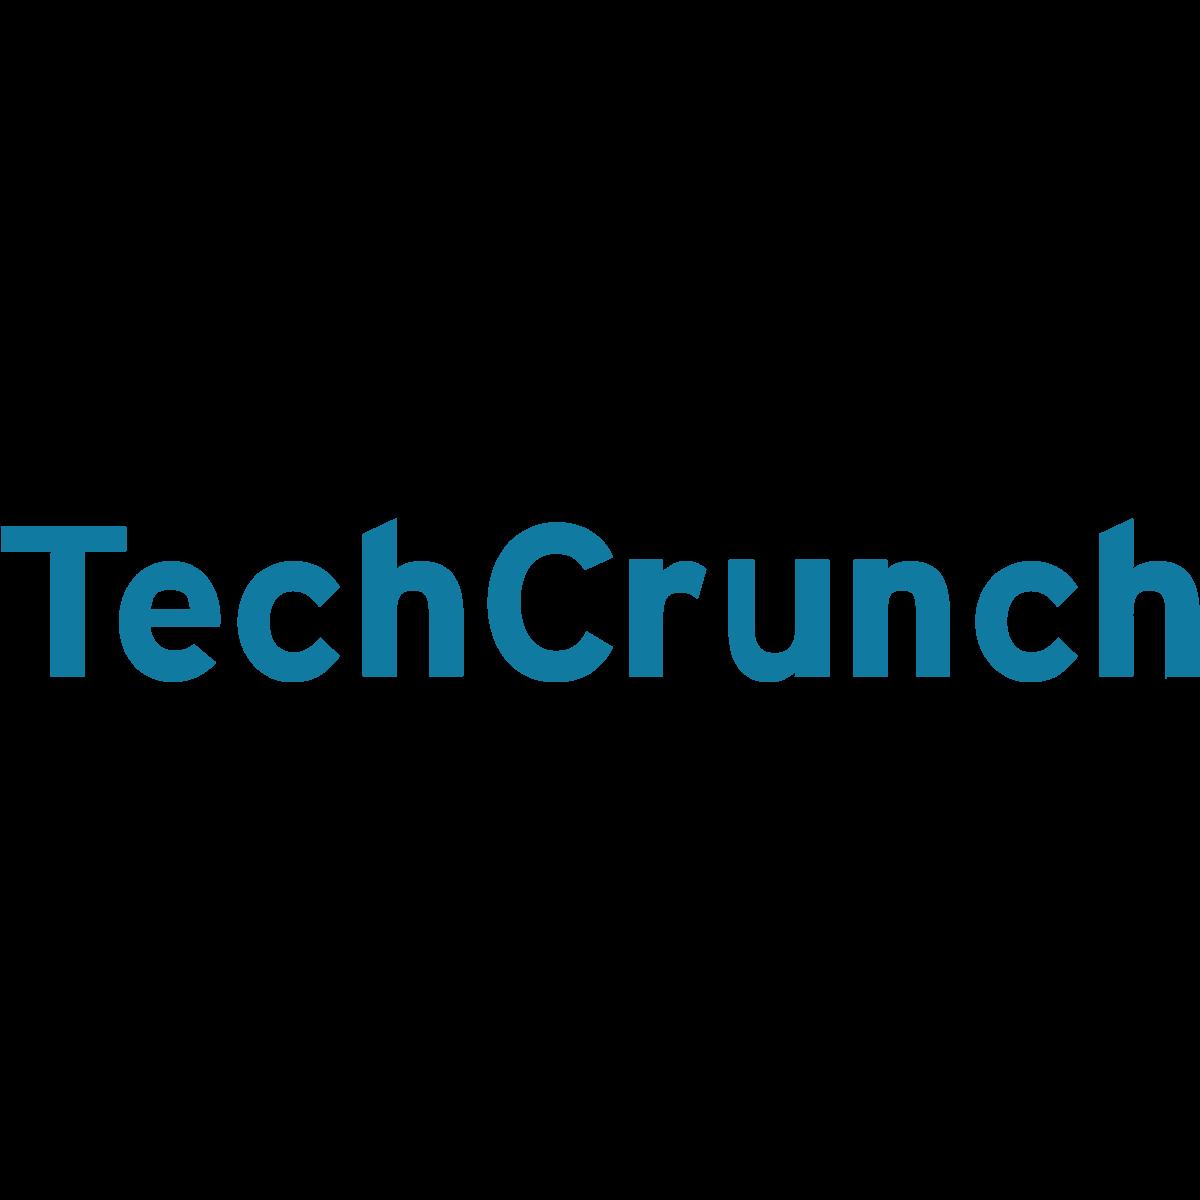 techcrunch-blue